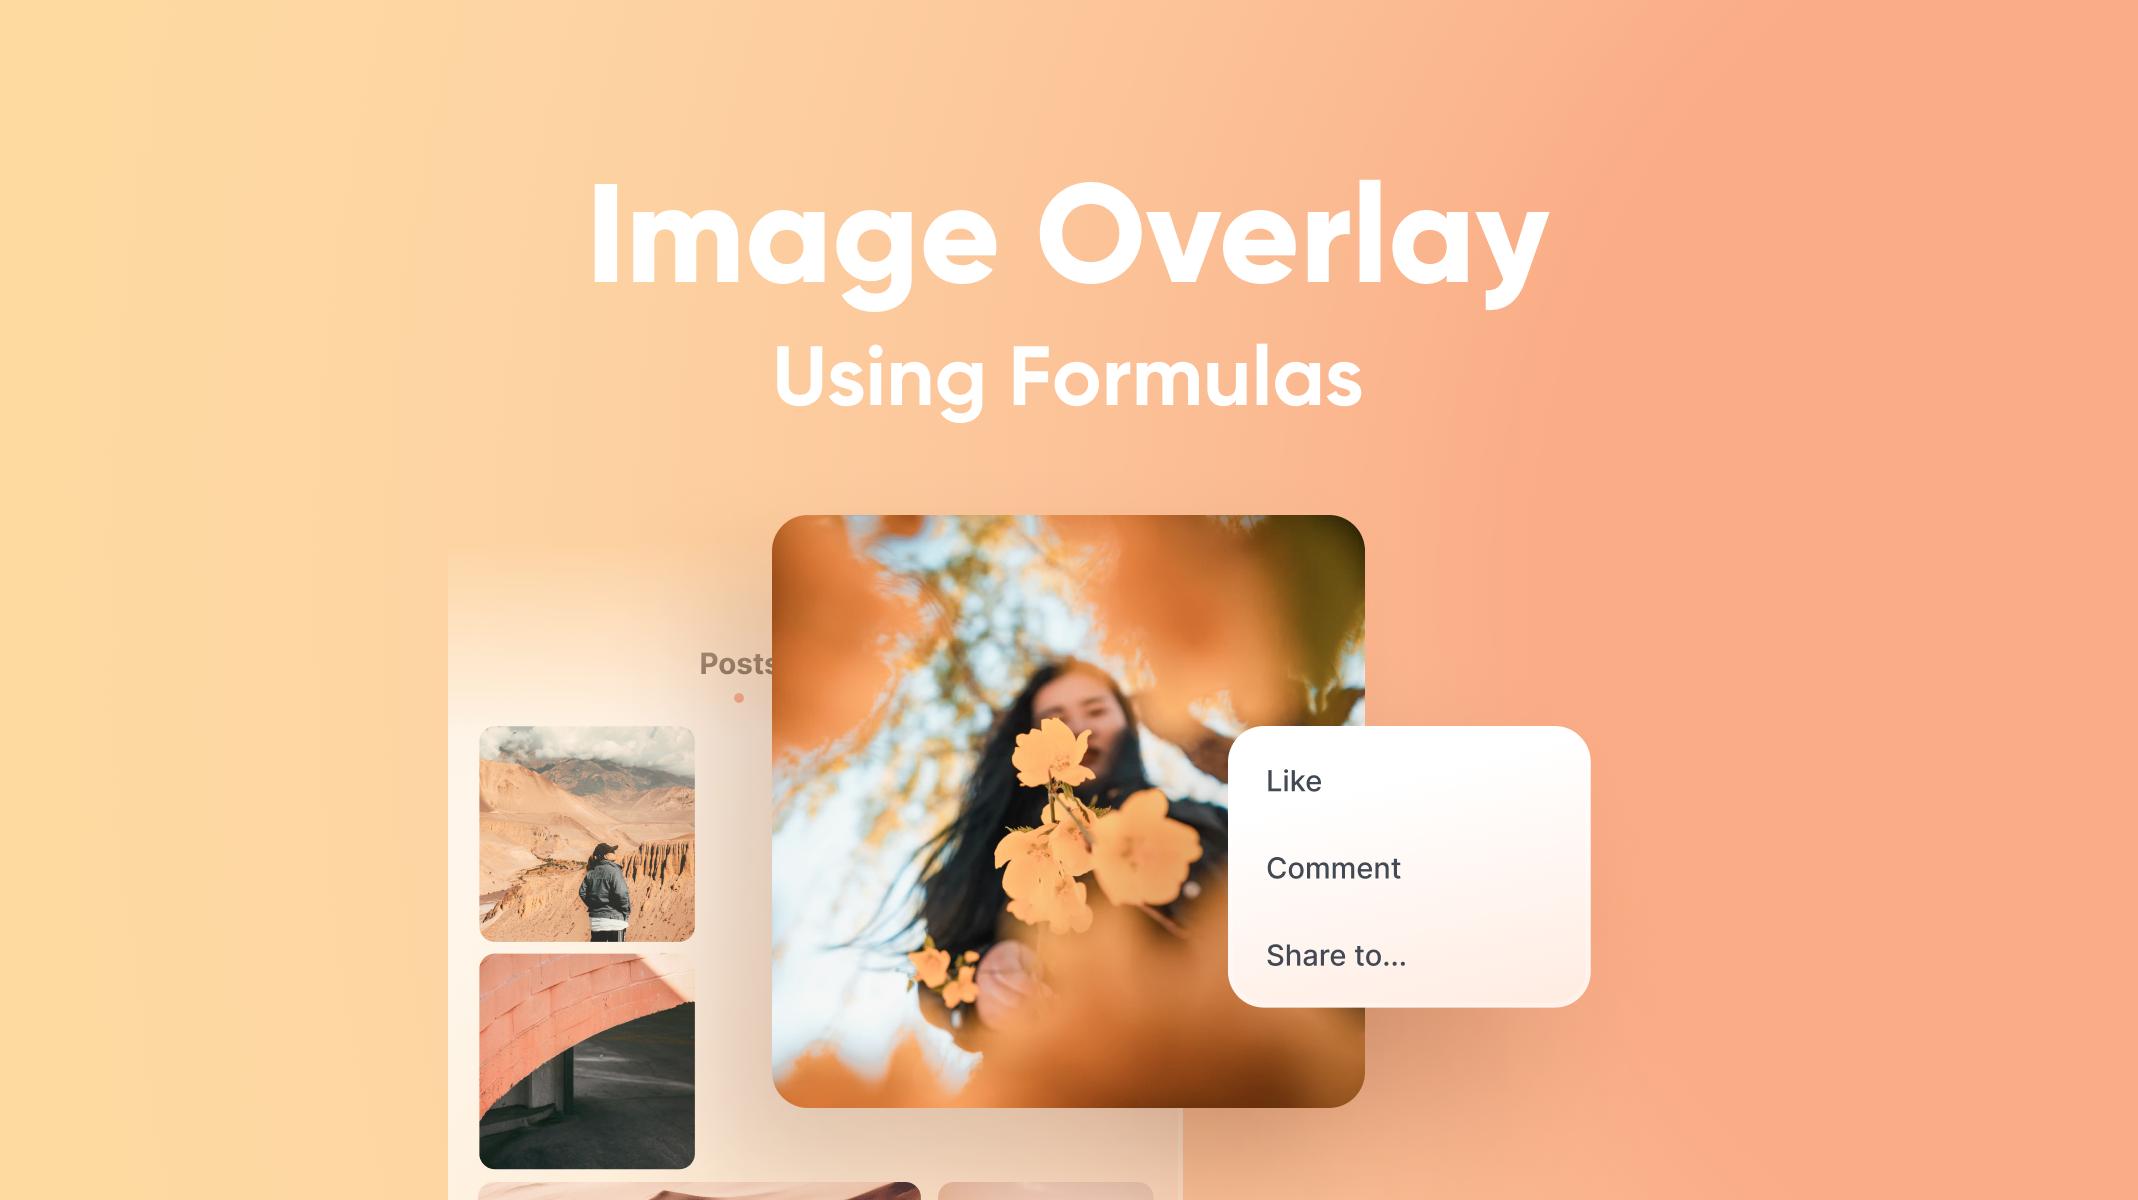 Image Overlay Using Formulas